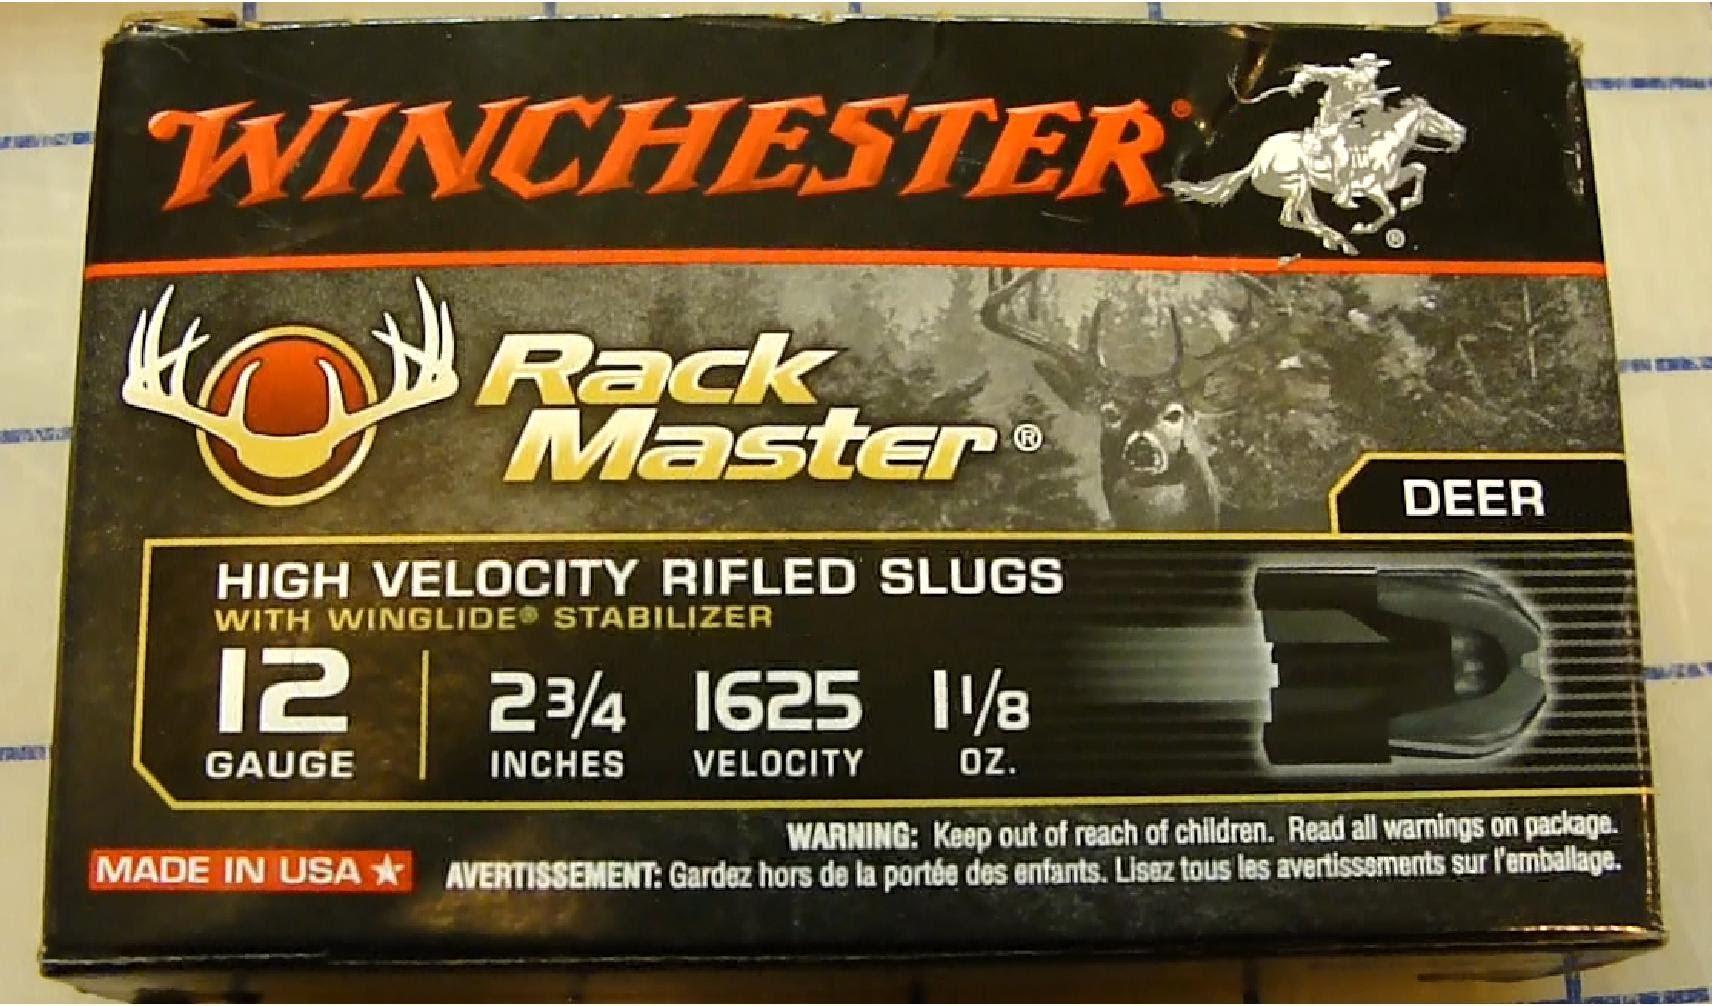 Winchester Rack Master 12ga Slug 1-1/8oz. Gel Test